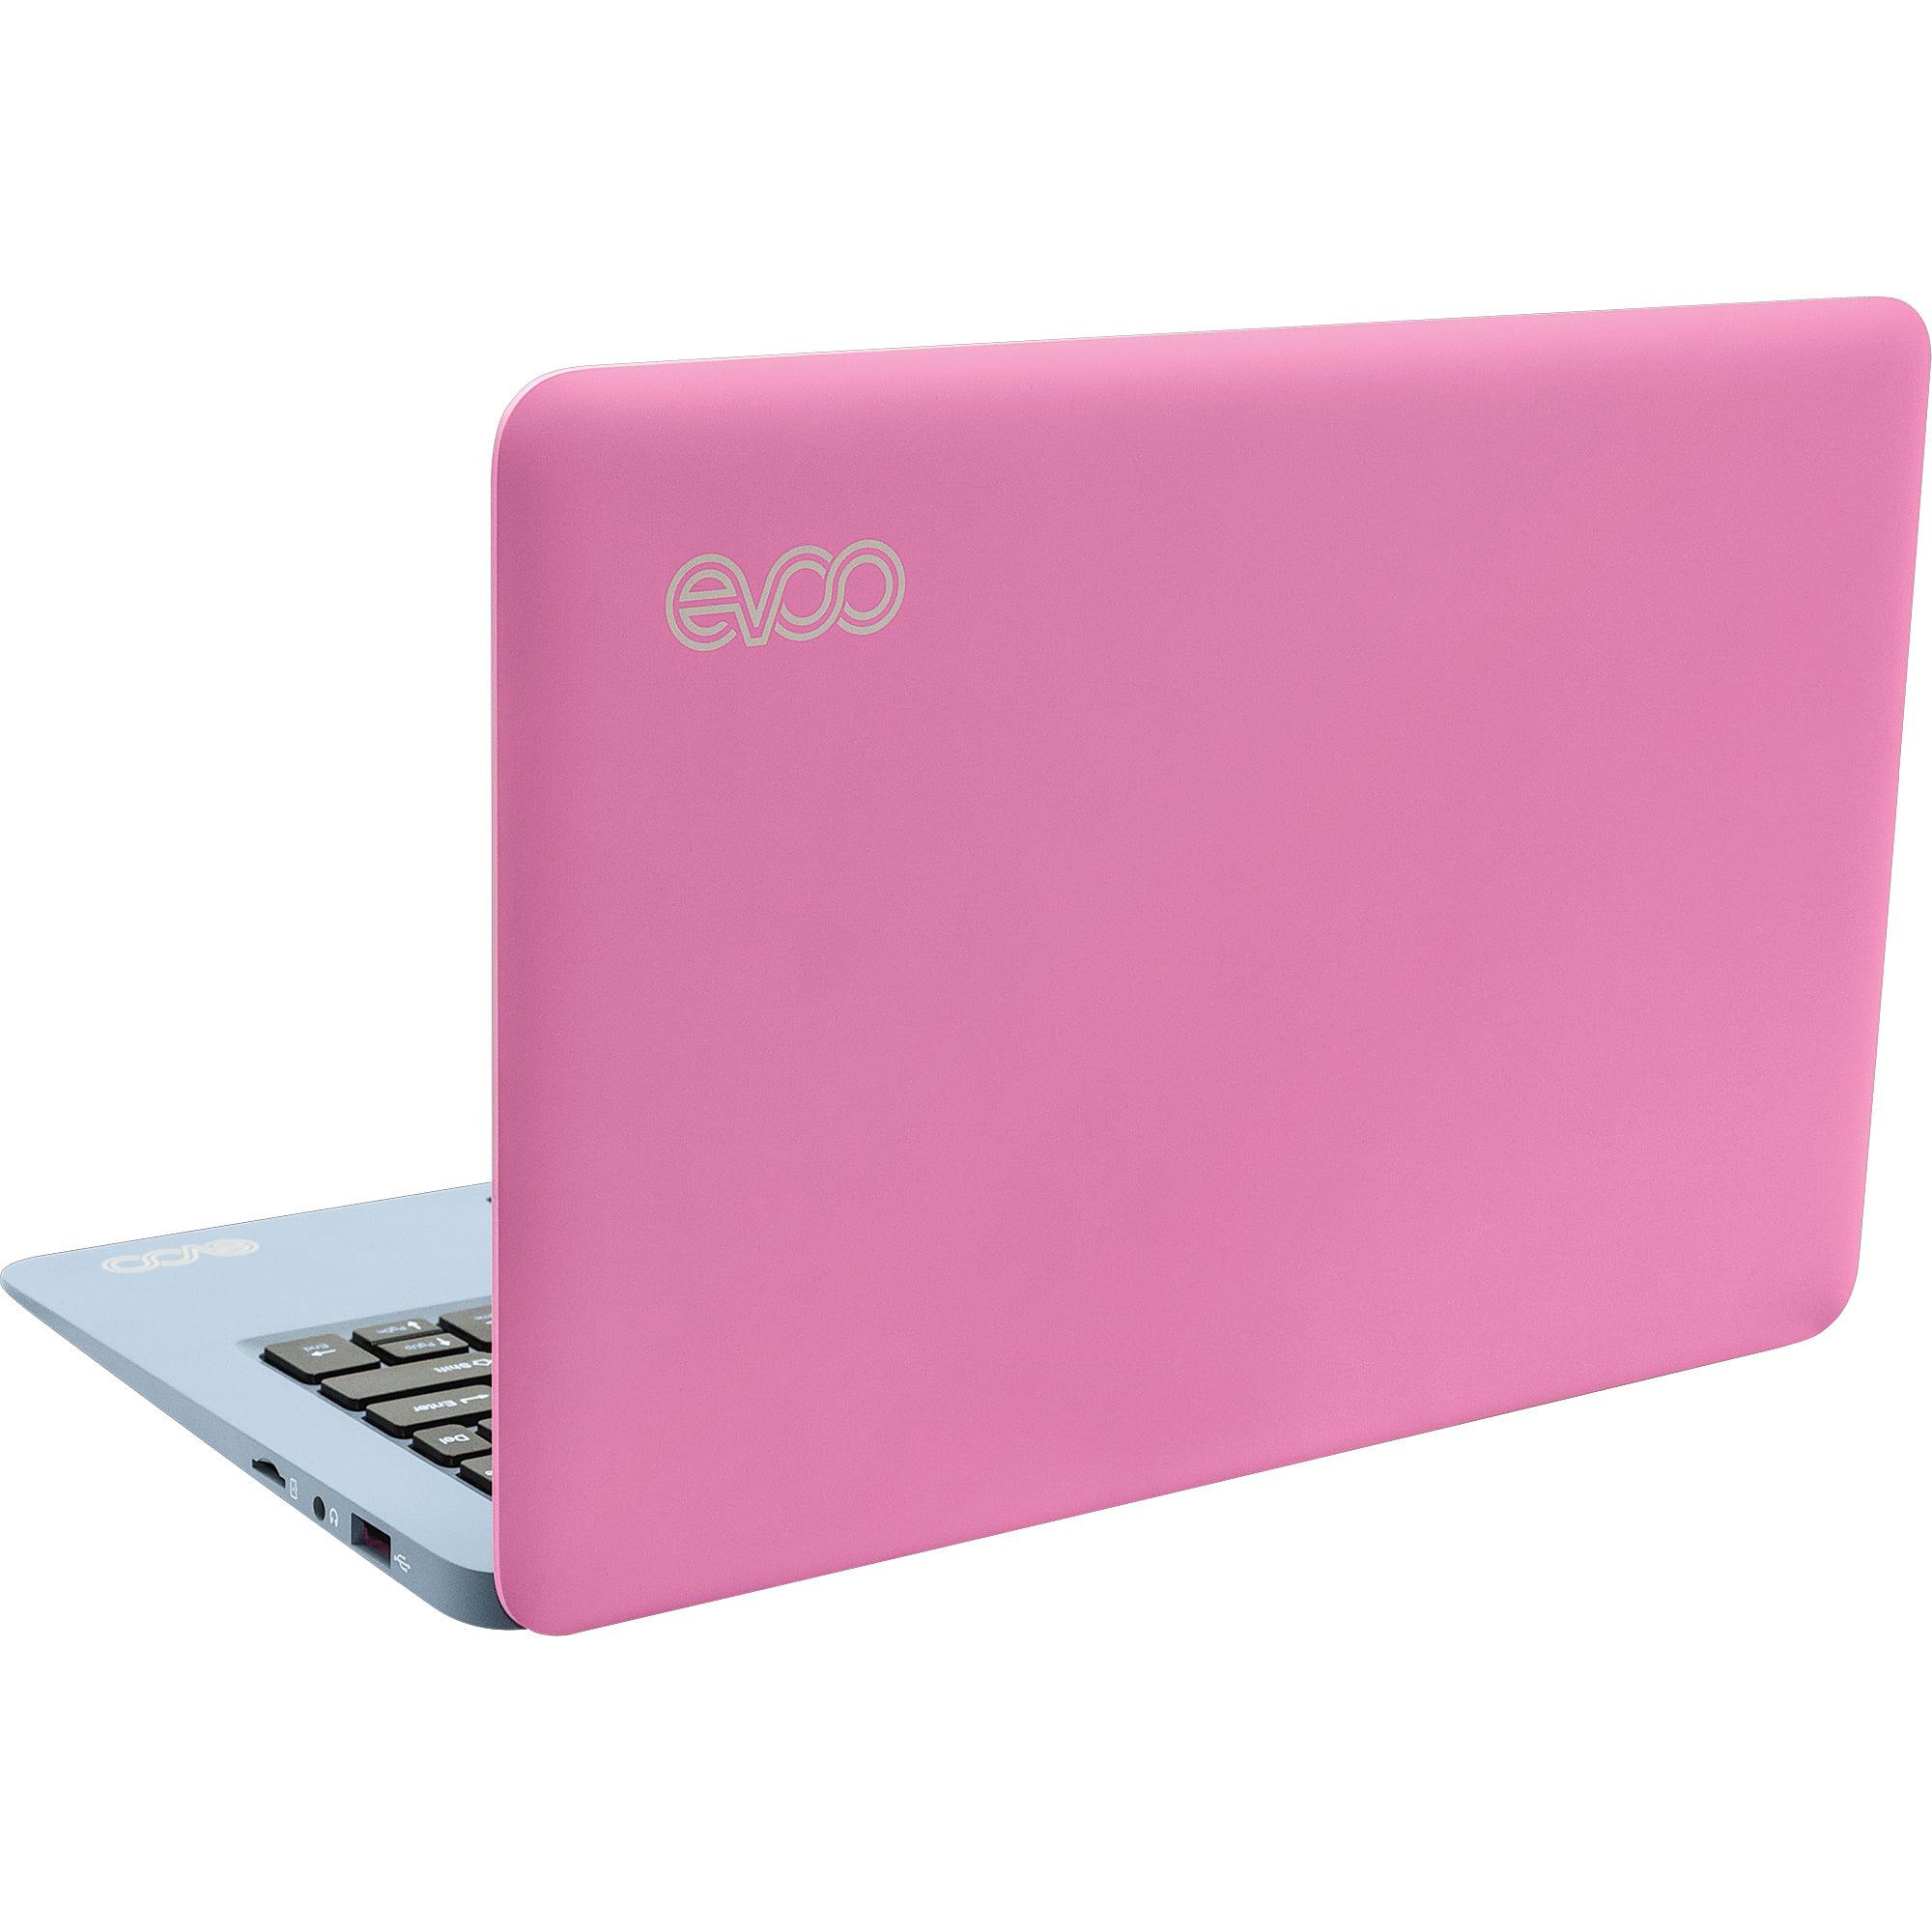 Evoo 10 1 Ultra Thin Laptop Windows 10 Home Quad Core 2gb Memory